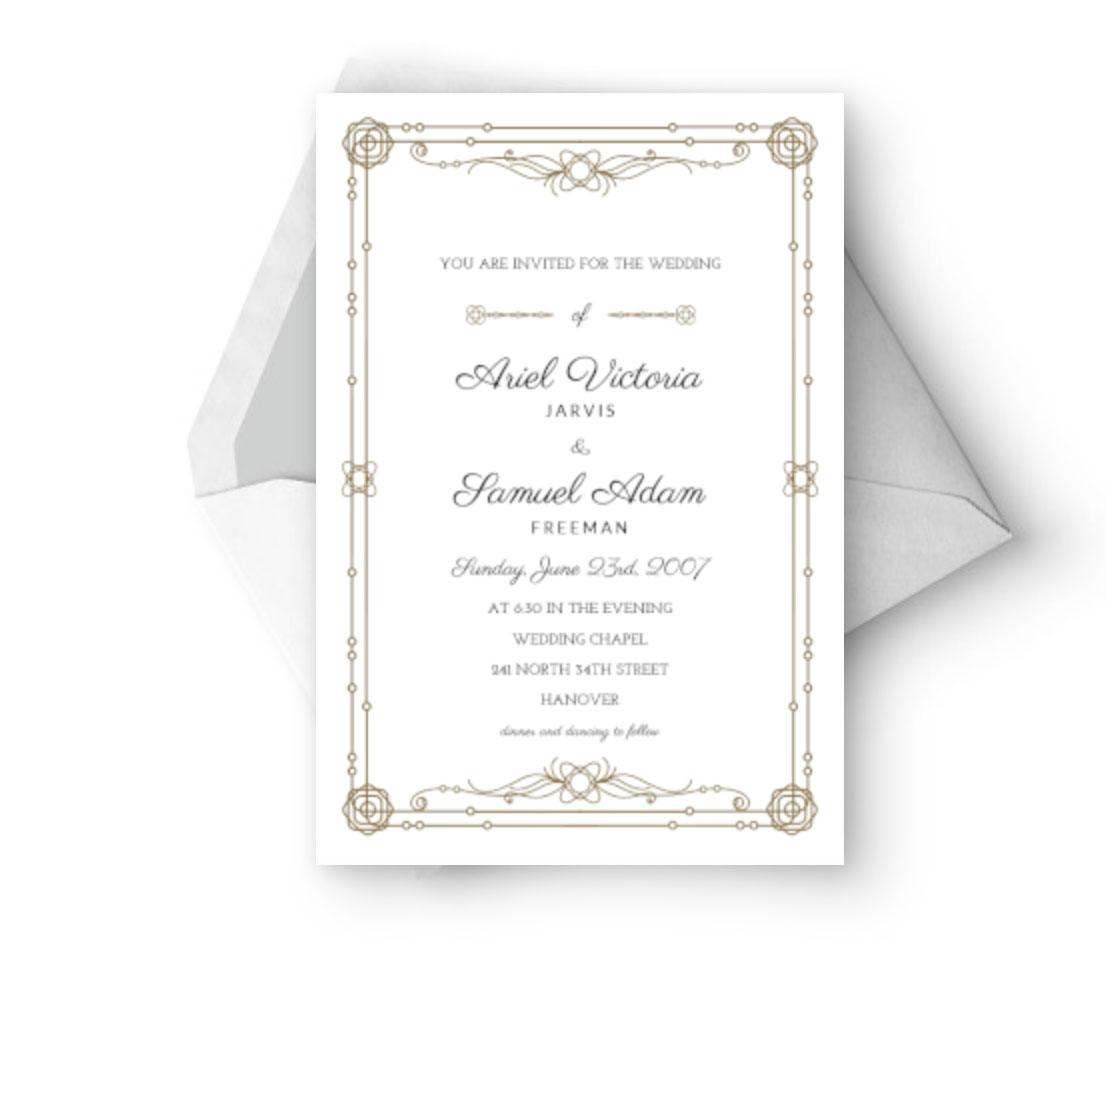 Classic border wedding invitation card